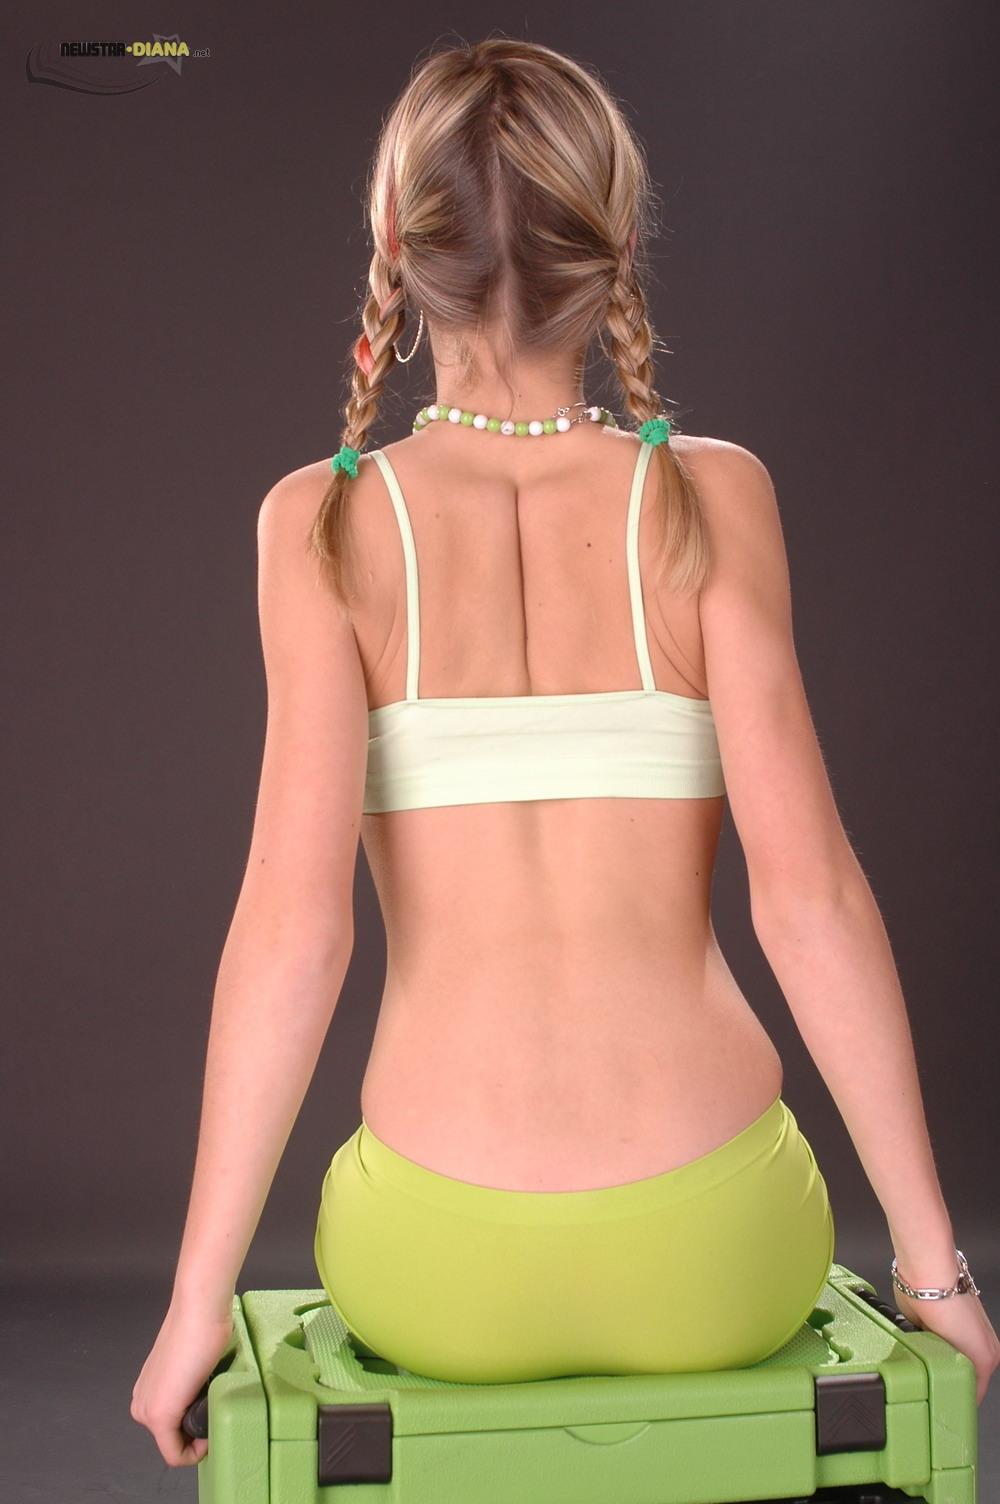 newstar diana green bikini vlad